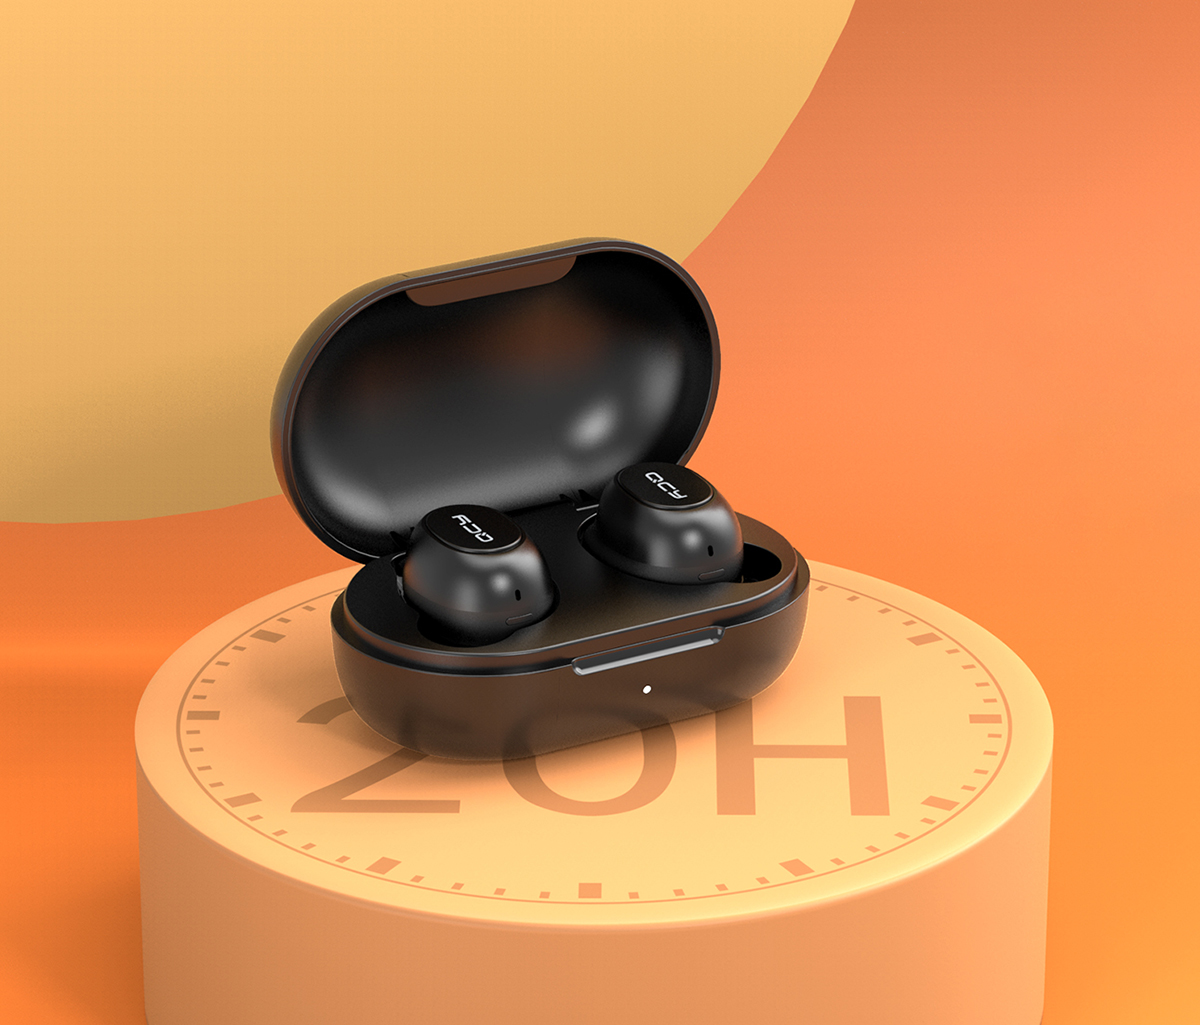 Безжични слушалки QCY T9, Bluetooth 5.0, TWS